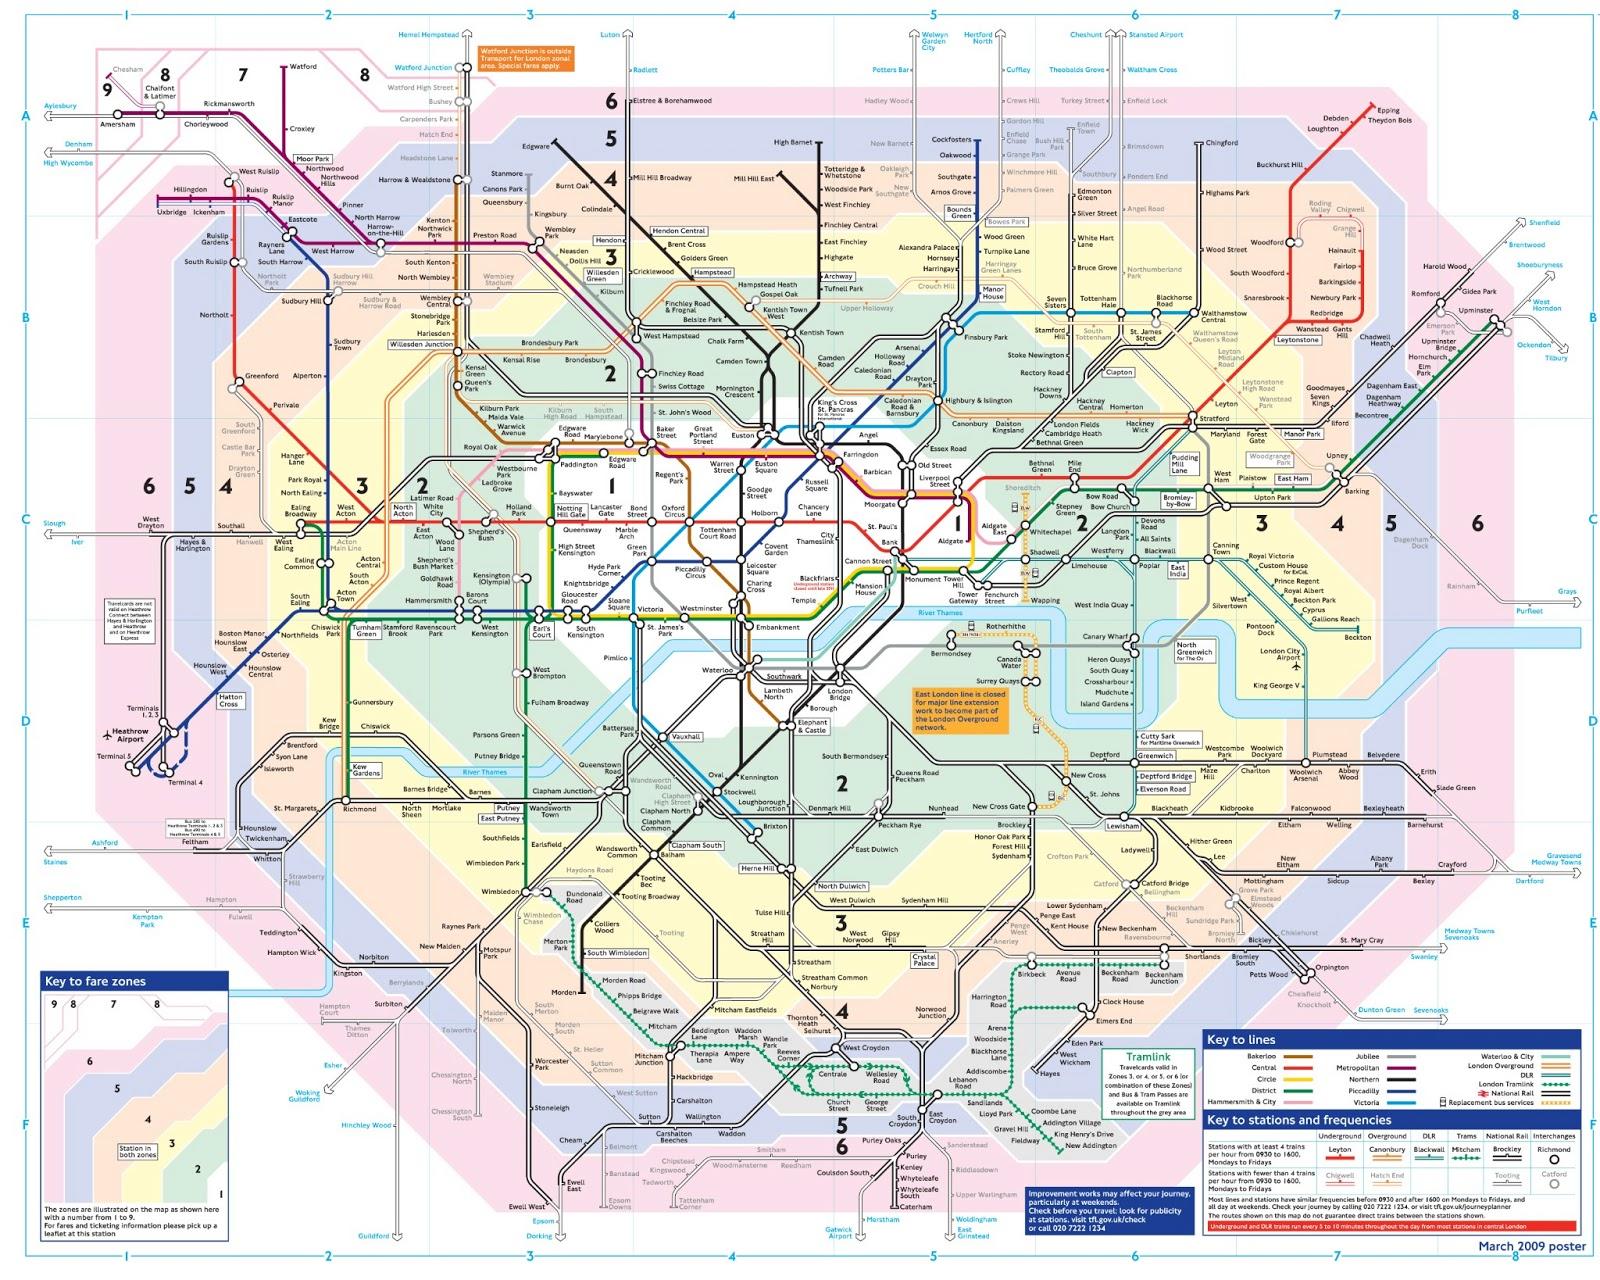 London Map Zone 1-9 on london bus map, london building map, london sky pool, london points of interest, london train map, london postcode map, london red map, london monitor, london global map, london rex, trafffic charge london map, london fallen angel, london zone 1, london congestion charge map, london cambridge map, london travel zones, london home map, london map tourist, london tube passes for tourists, london metro map,